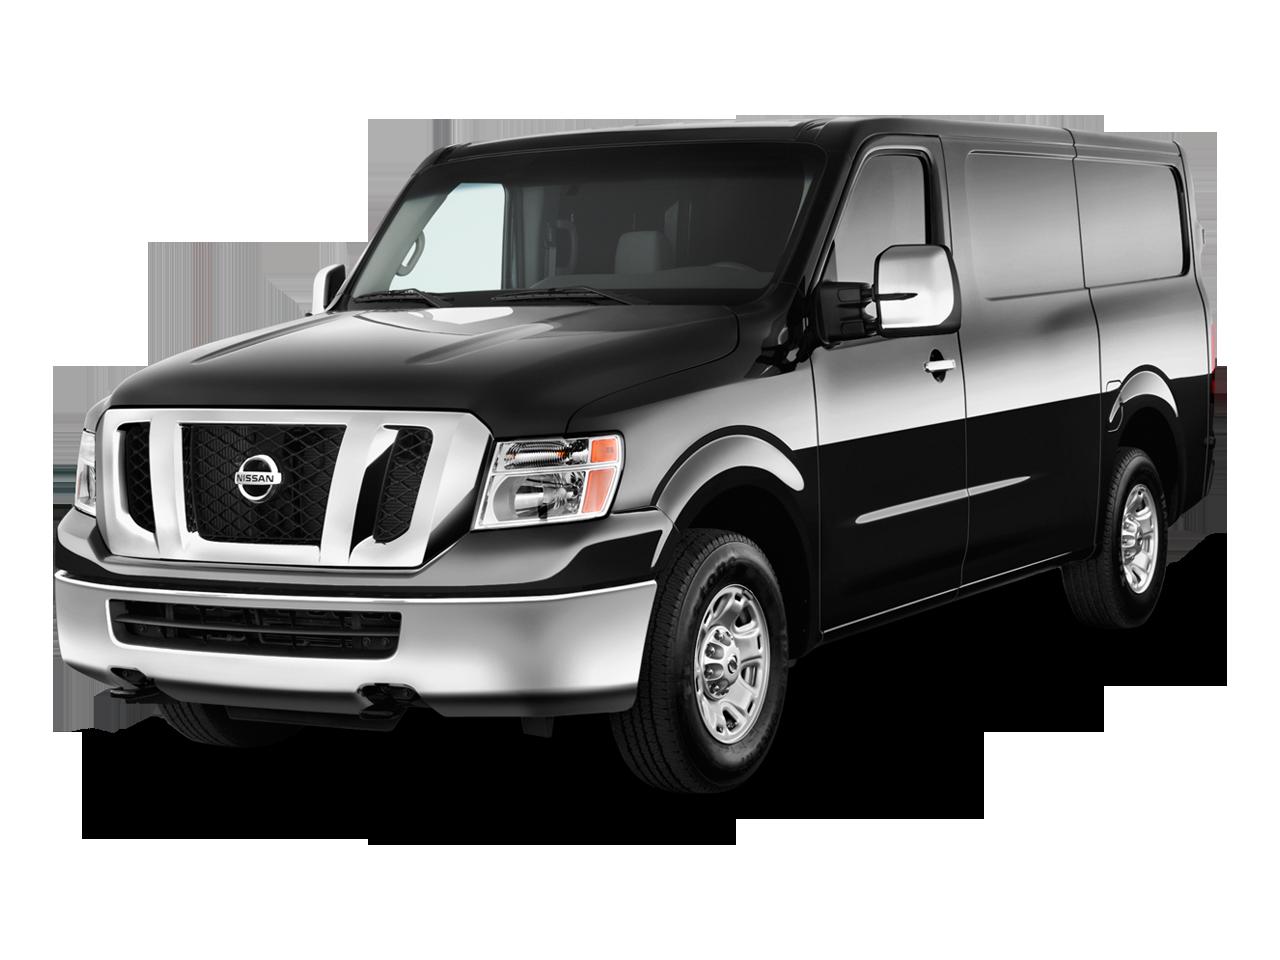 nissan nv2500 google search trucks pinterest cargo van nissan and vehicle. Black Bedroom Furniture Sets. Home Design Ideas